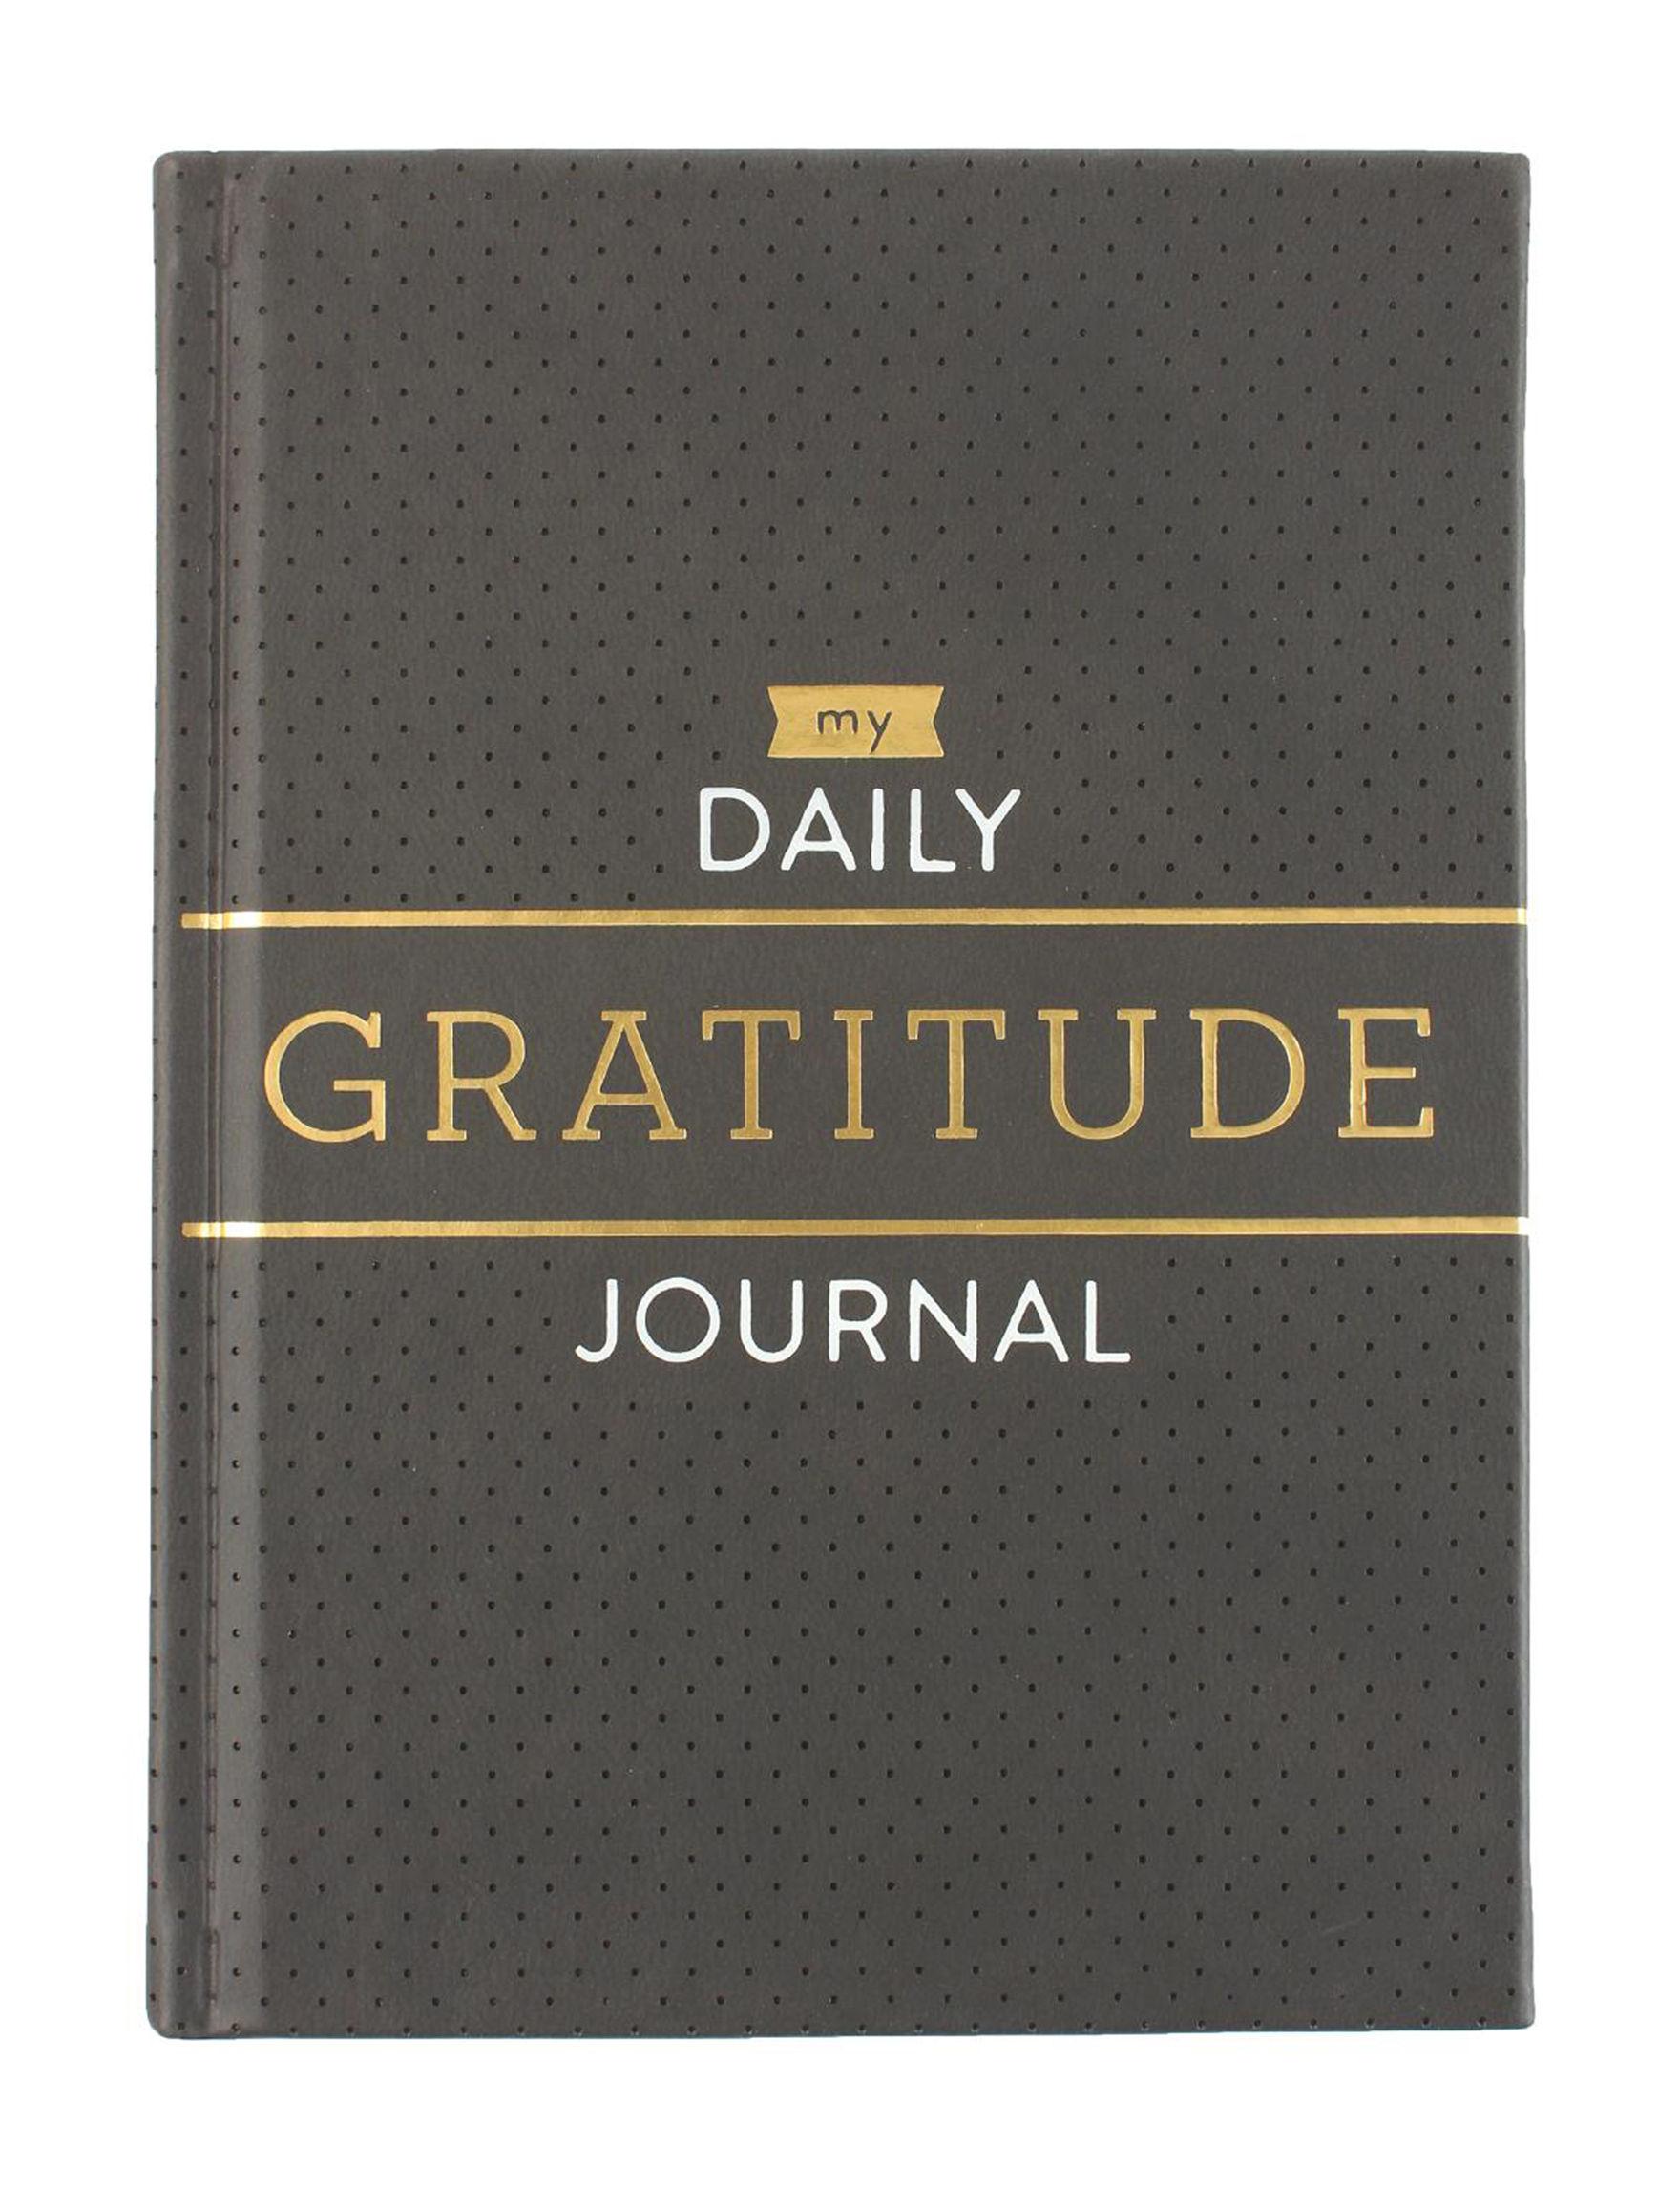 Eccolo Gray Journals & Notepads School & Office Supplies